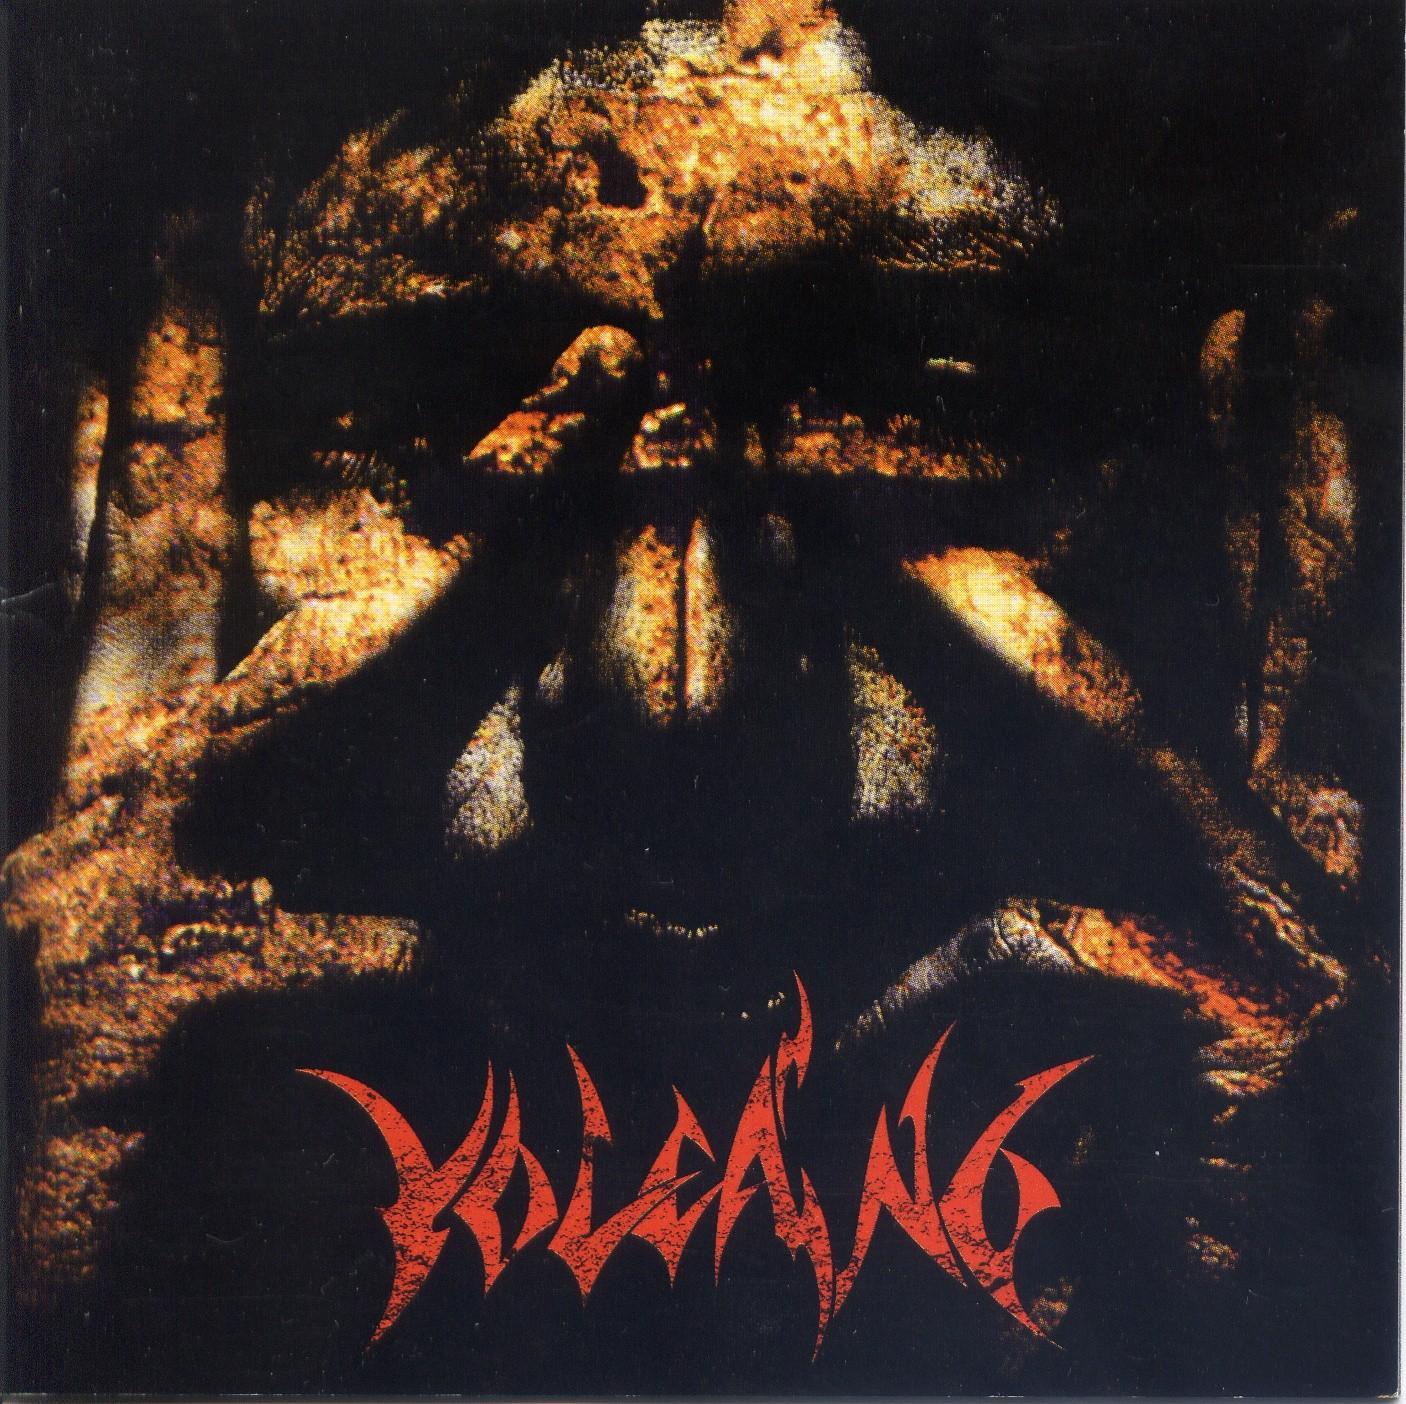 Volcano - Violent - 2000